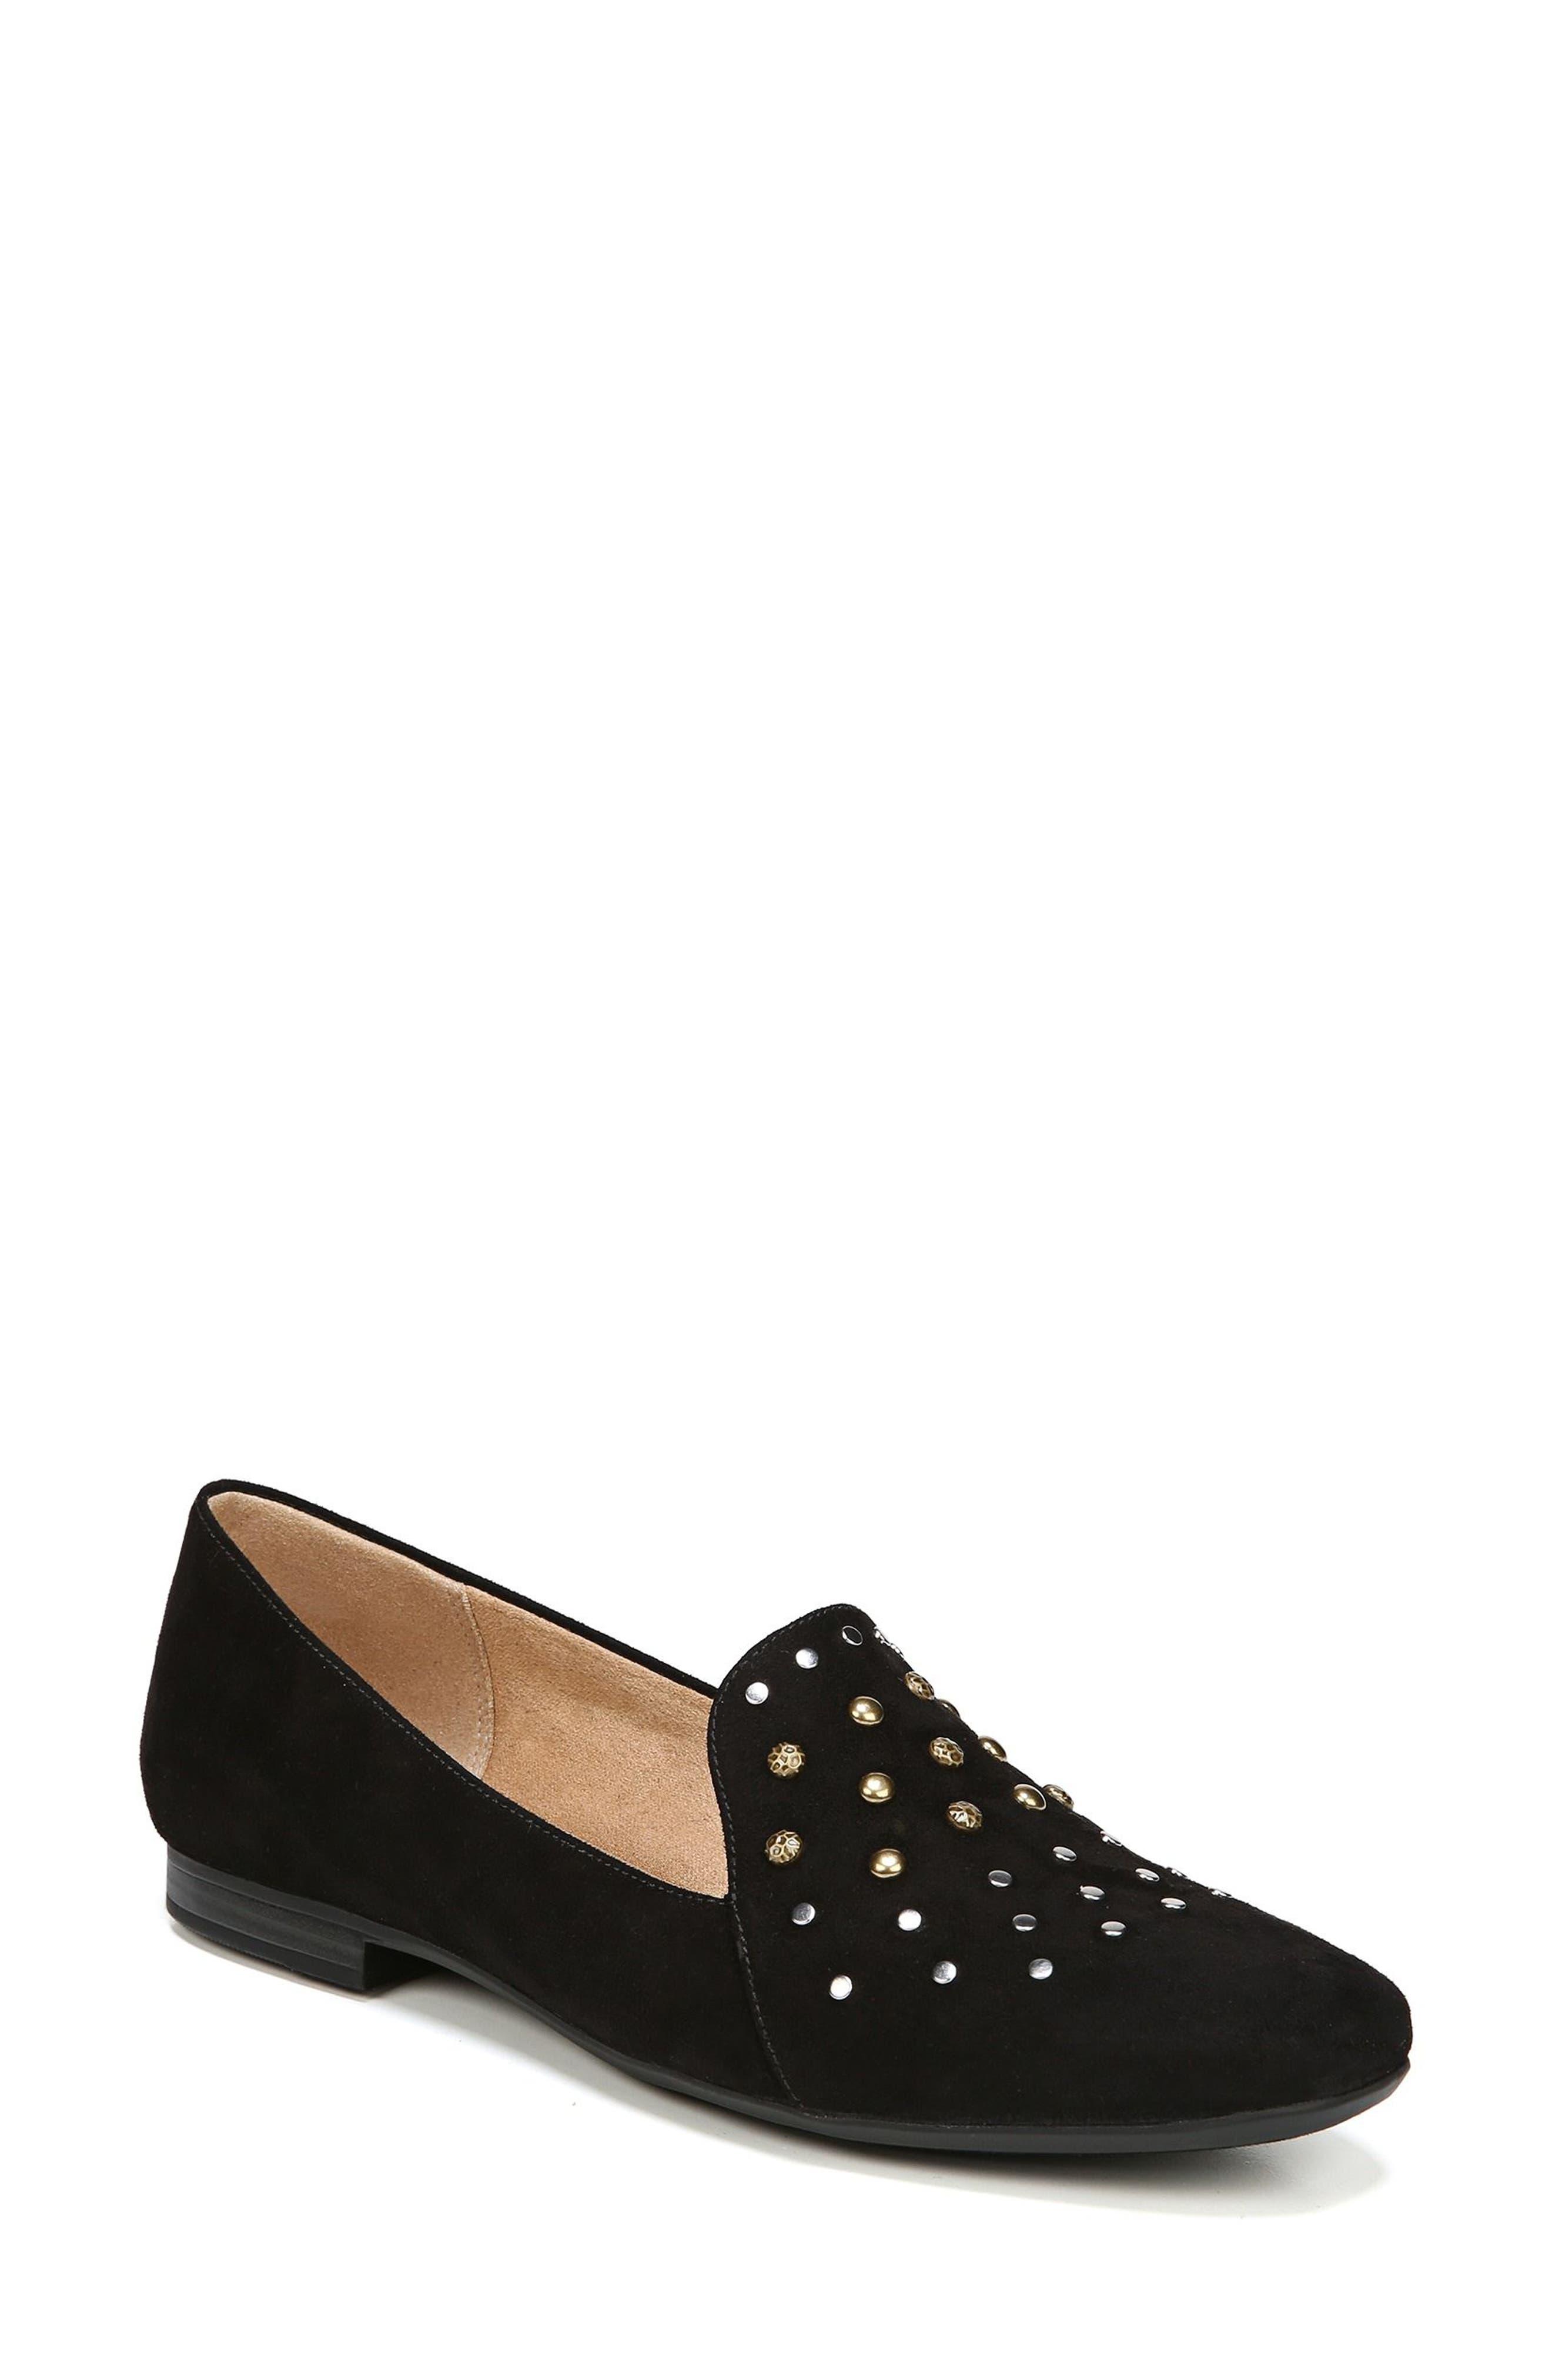 Emiline 4 Loafer,                         Main,                         color, Black Fabric